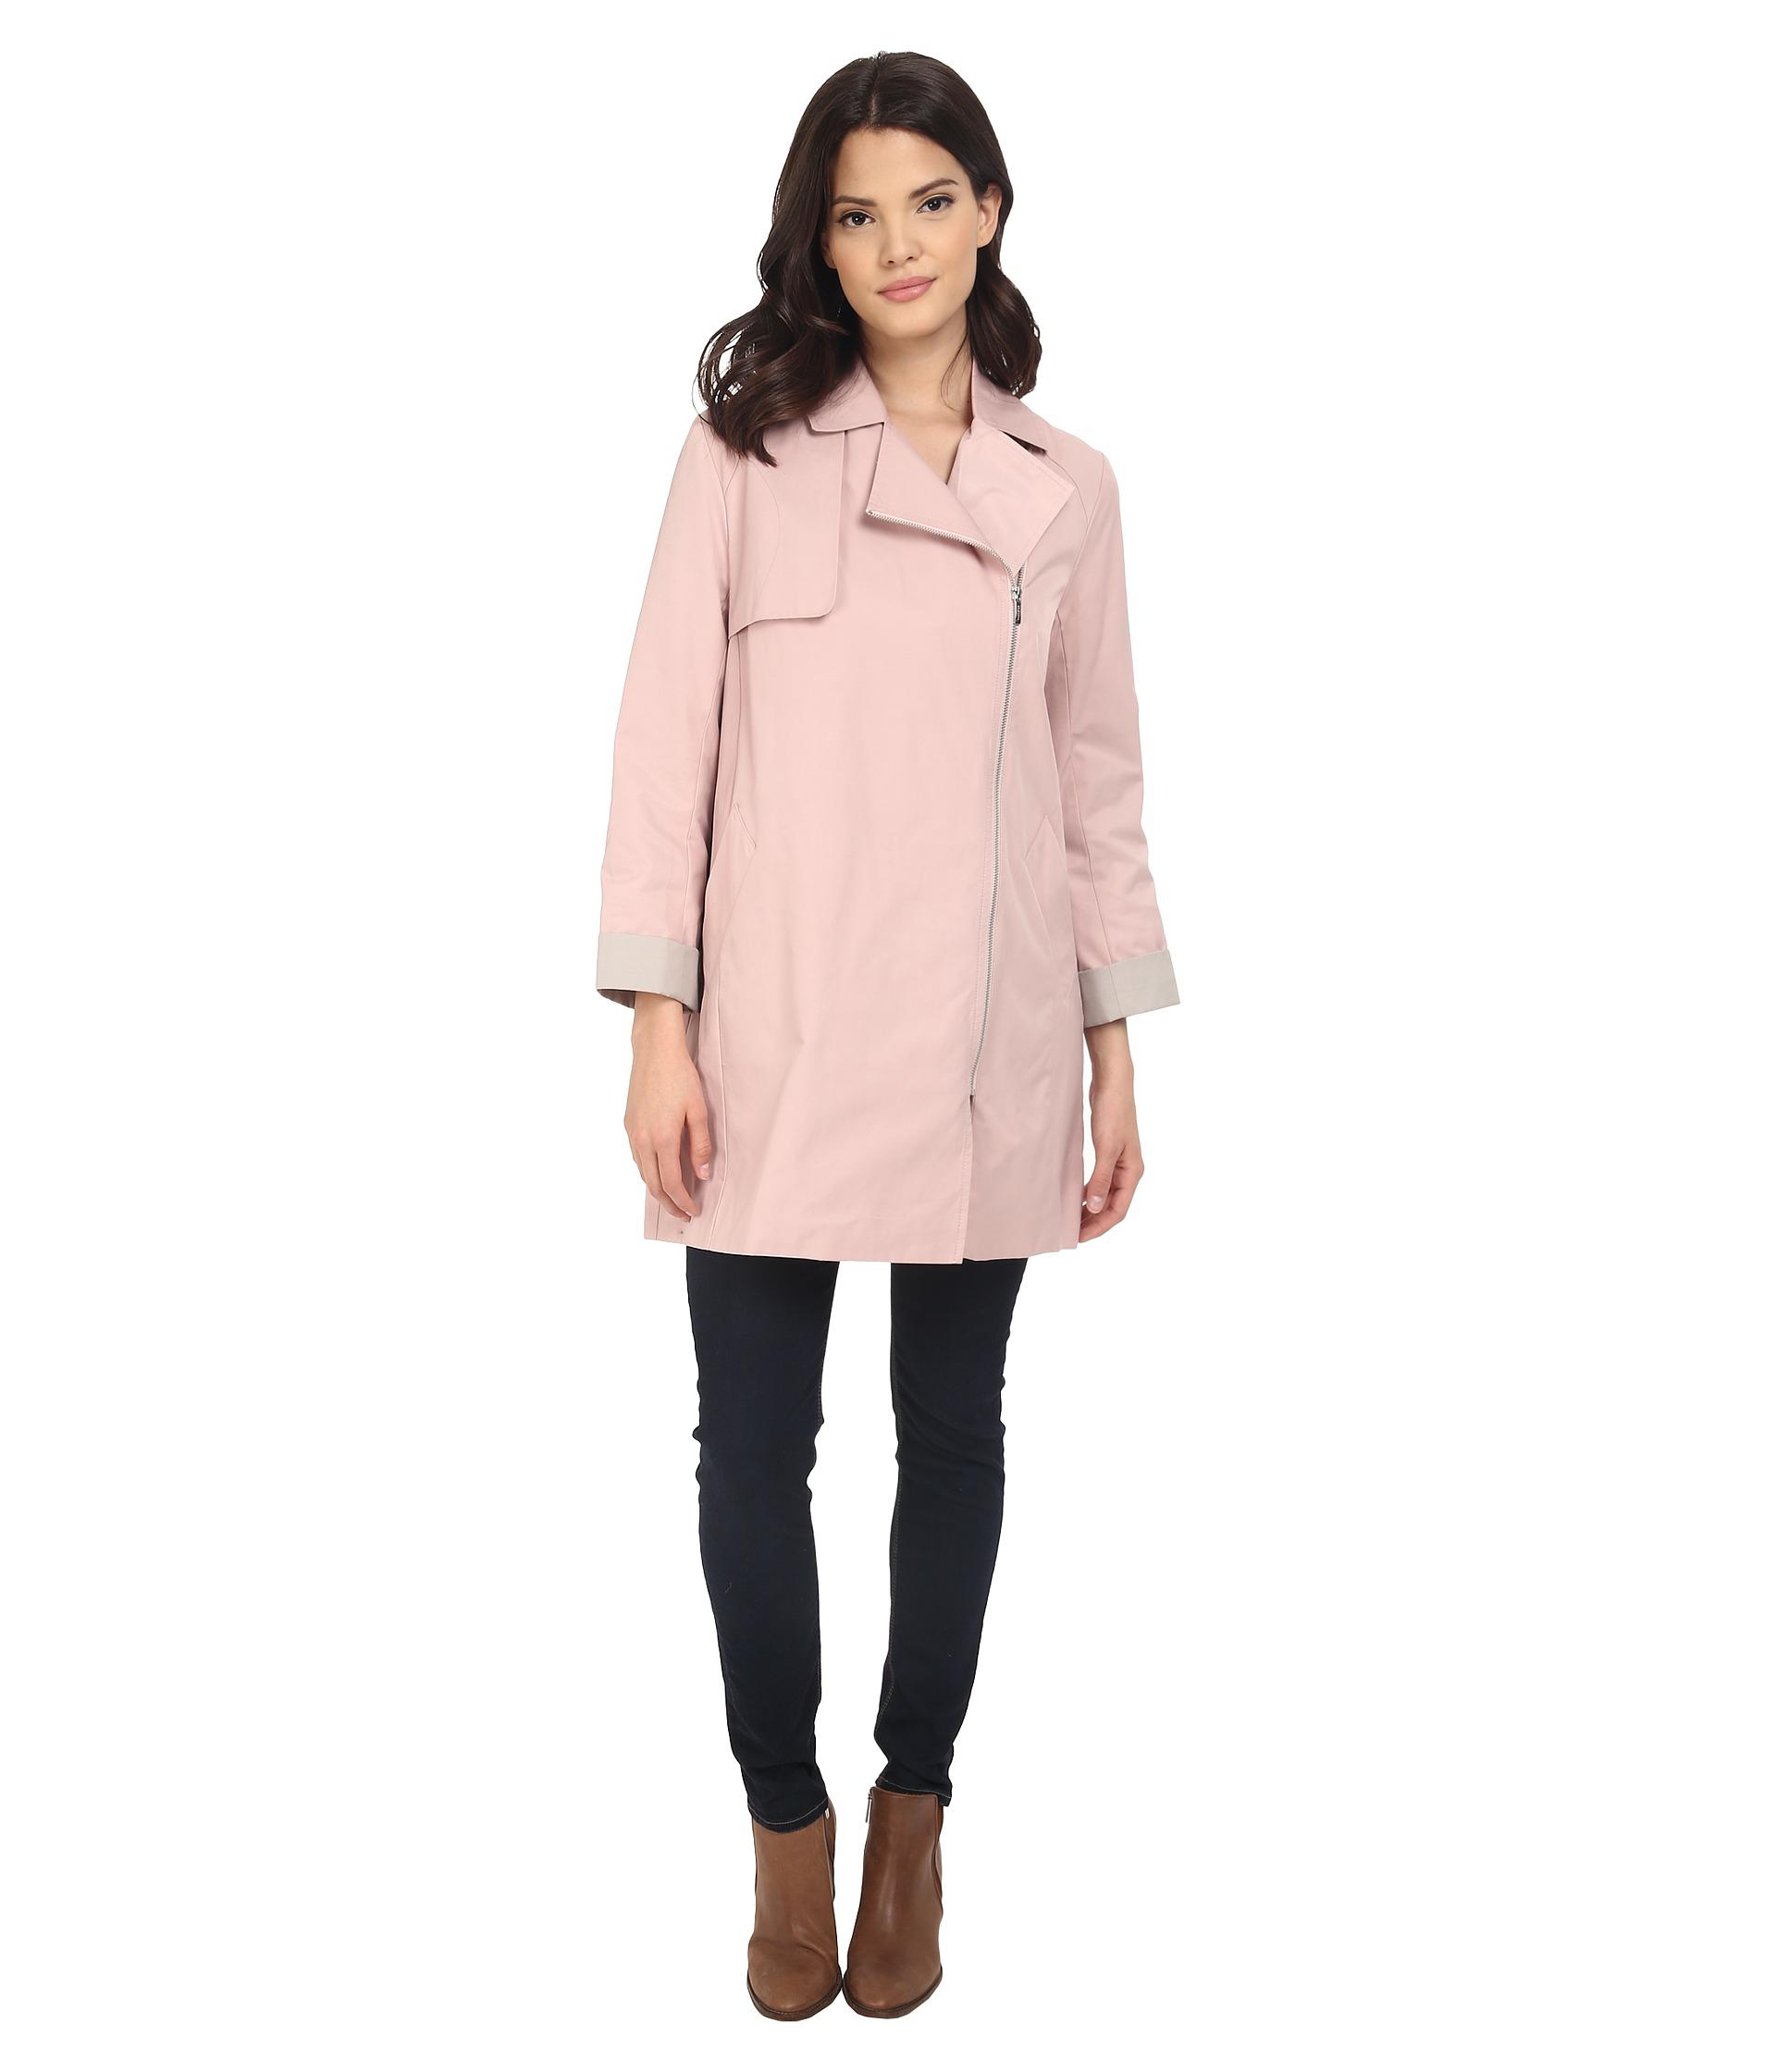 Cole haan Moto Swing Coat in Pink - Save 50%   Lyst